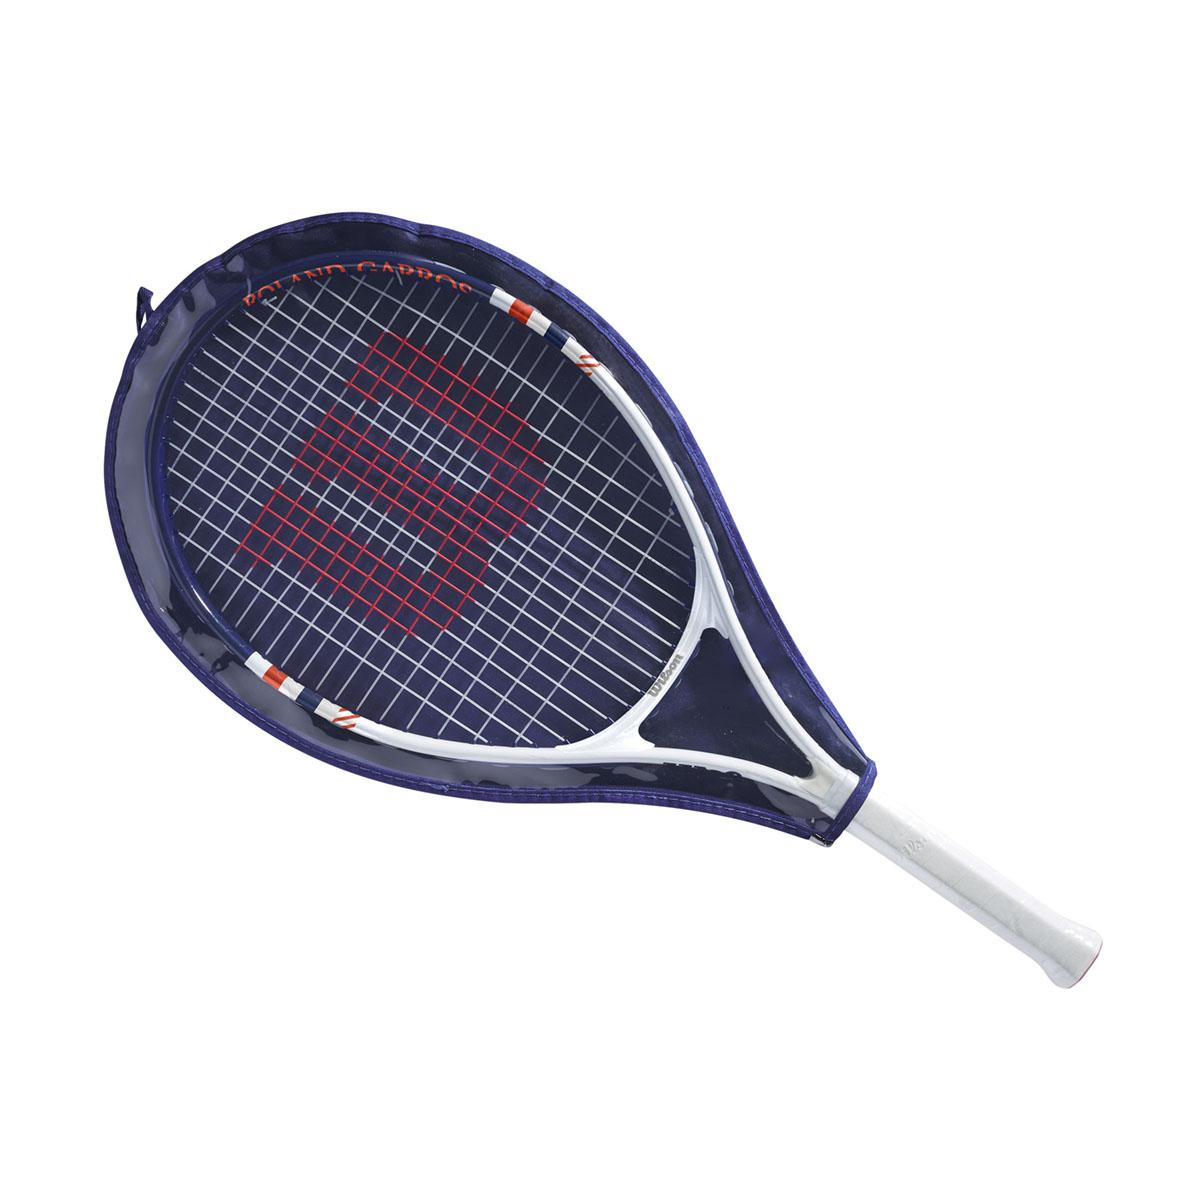 WR070210H_3_Roland_Garros_Elite_Competition_JR_BU_OR_WH.png.cq5dam.web.2000.2000